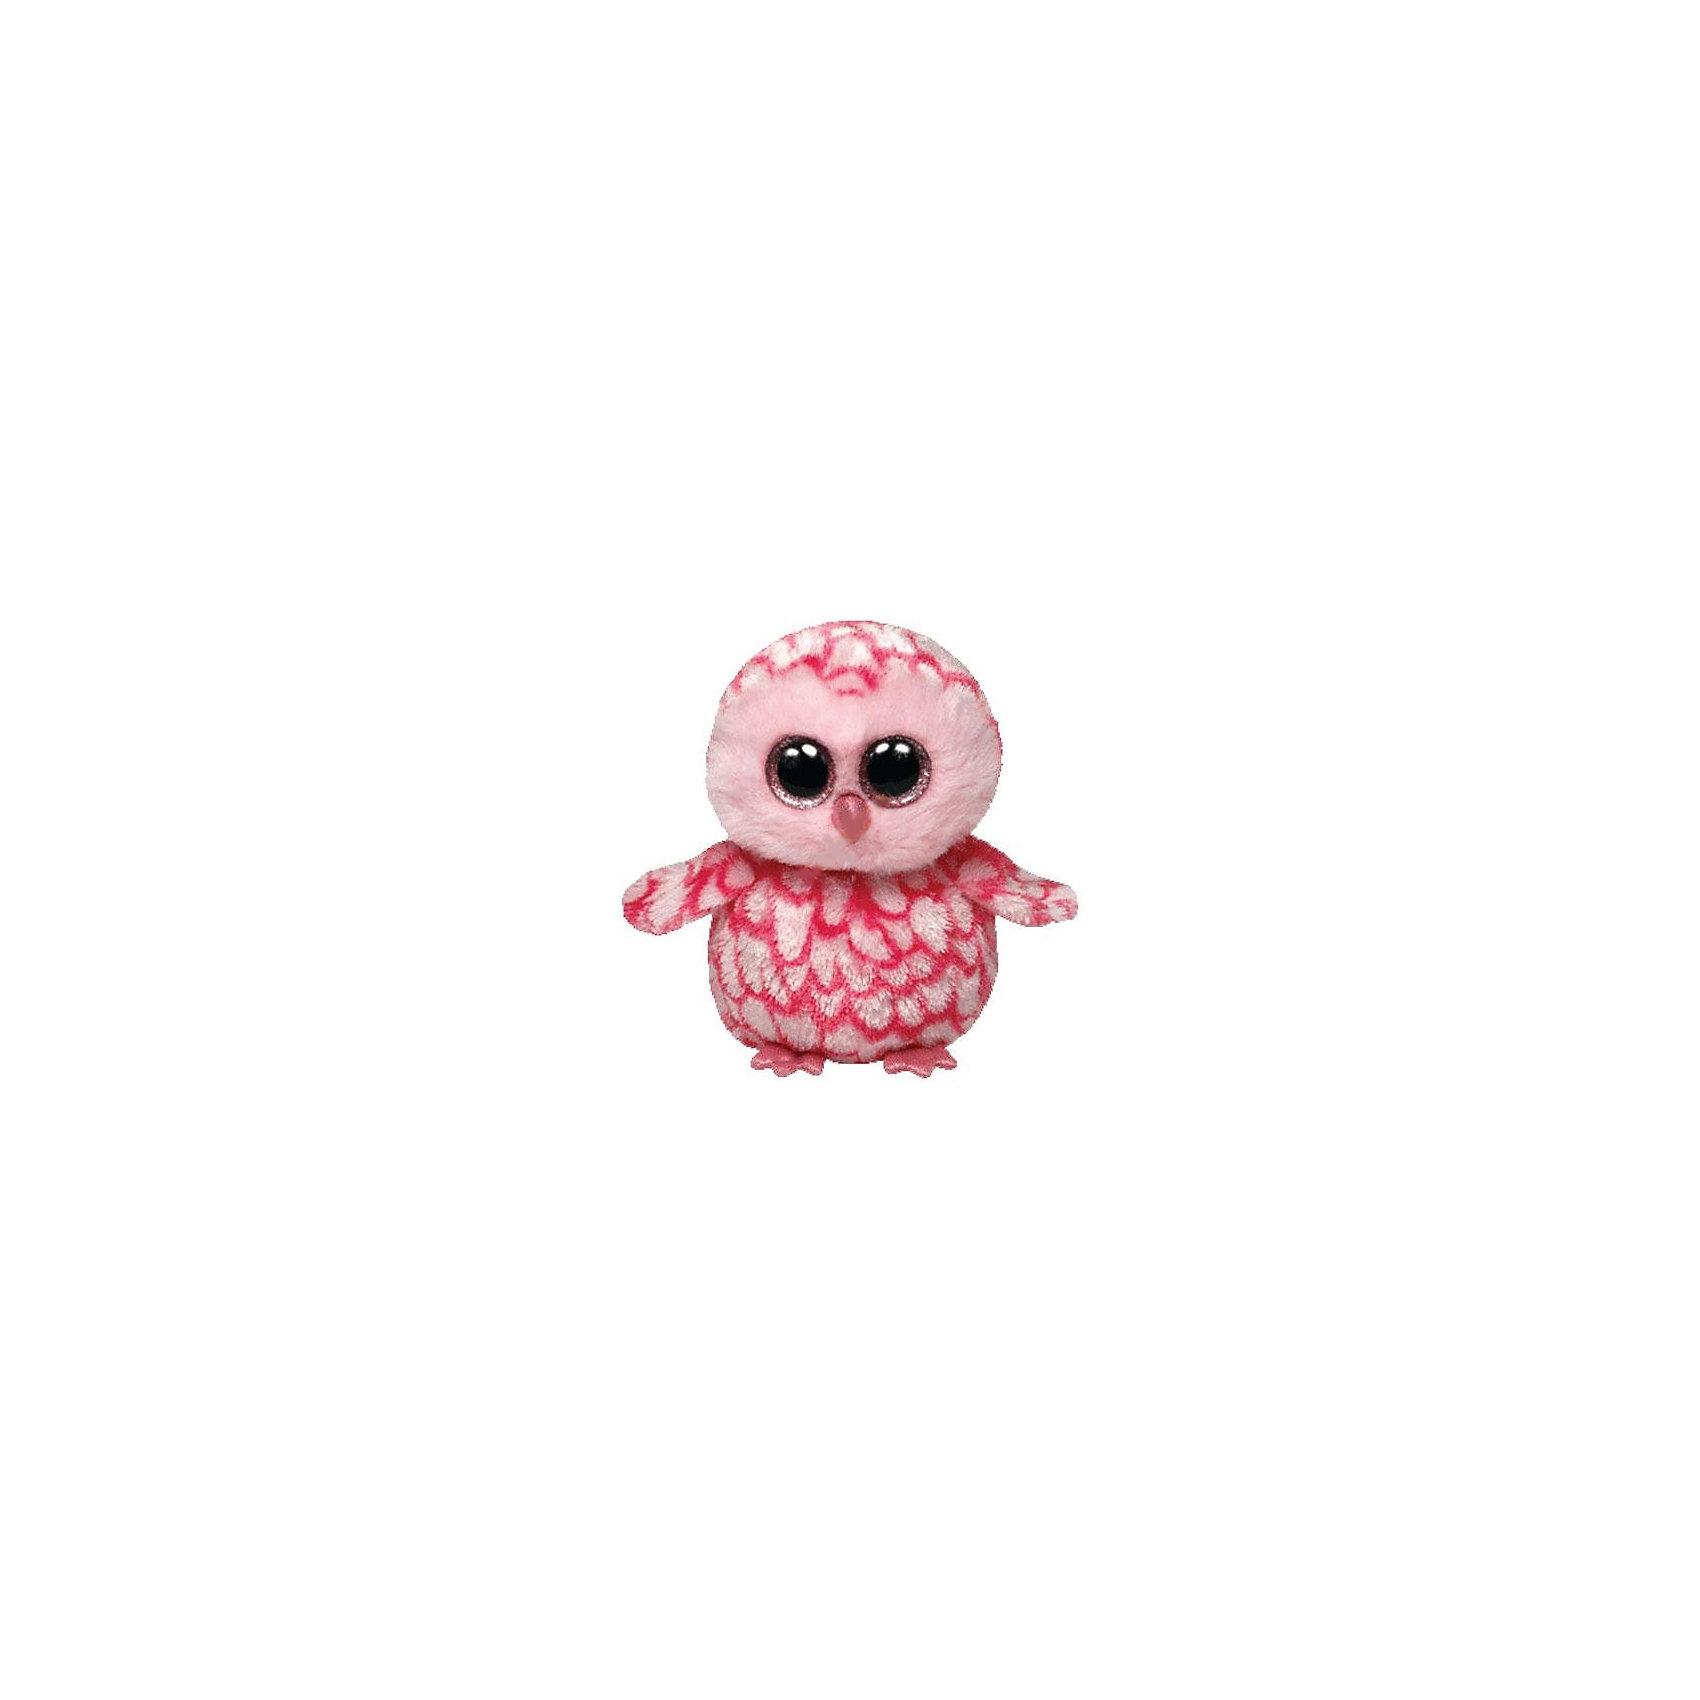 ������� (�������) Pinky, 15,24 �� (Ty)